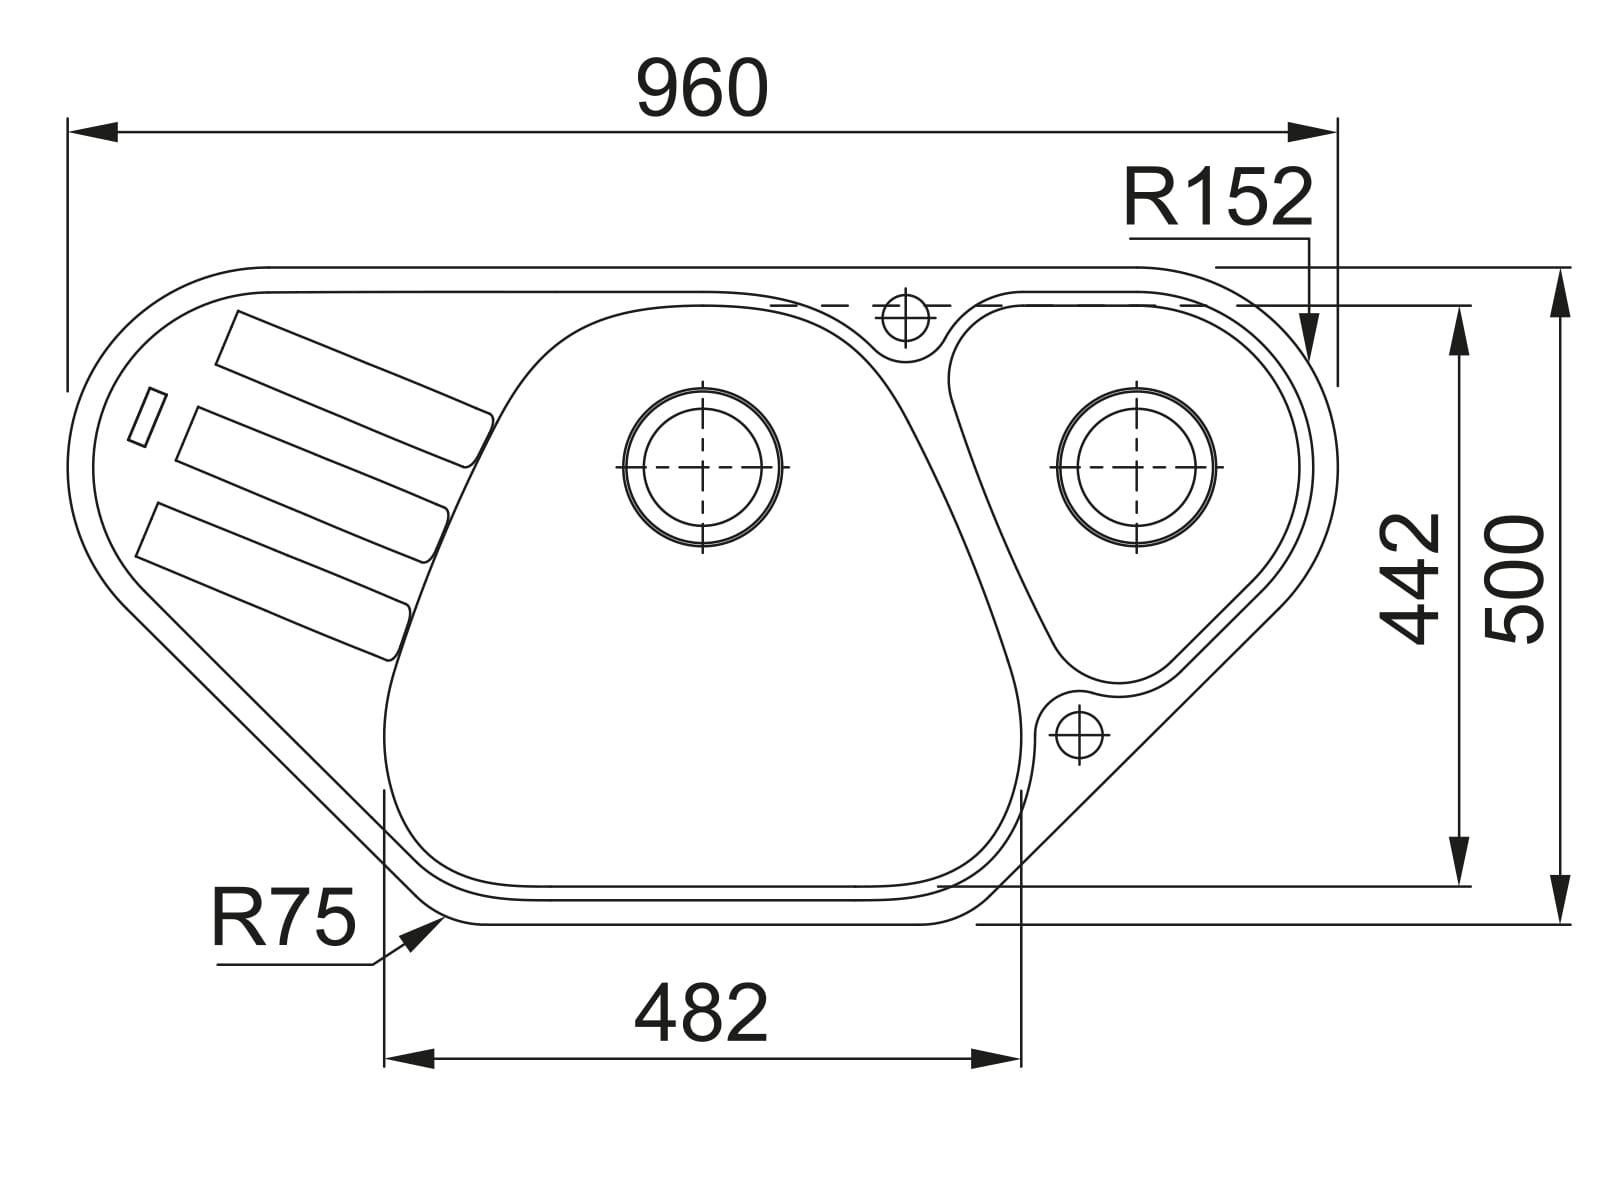 Franke Antea AZG 661-E Graphit - 114.0477.988 Granitspüle Exzenterbetätigung